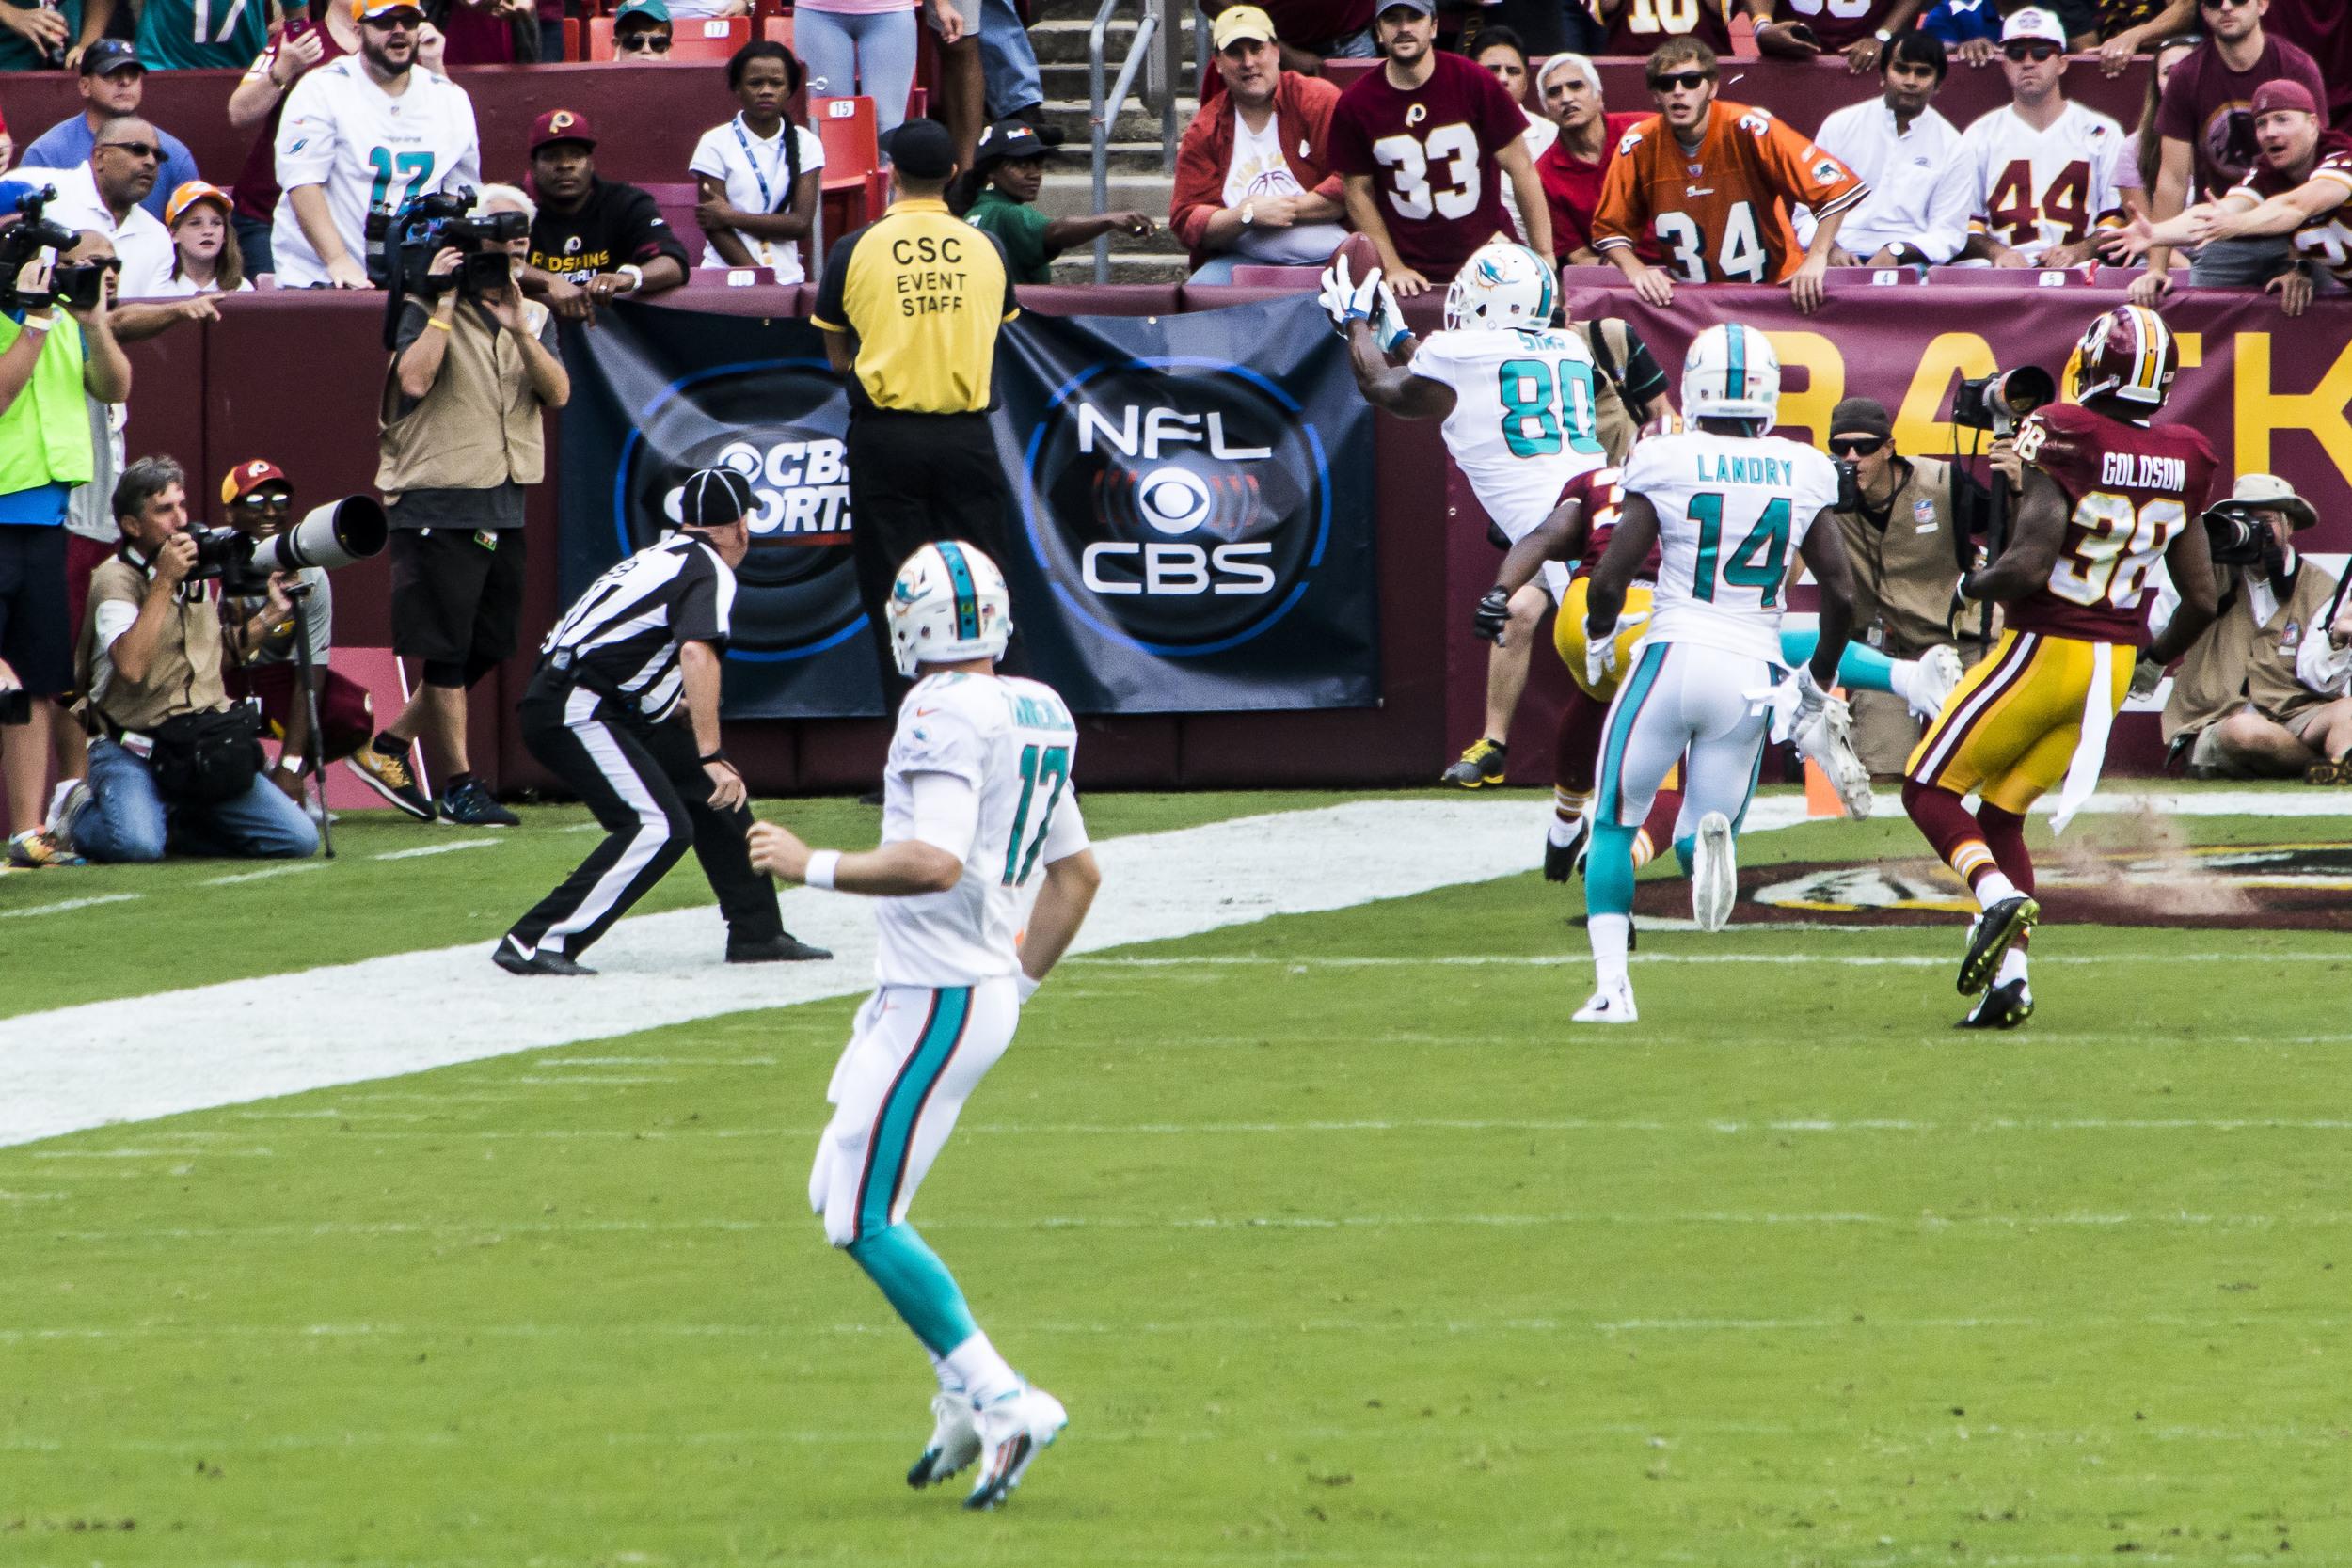 Redskins_Dolphins-9.JPG